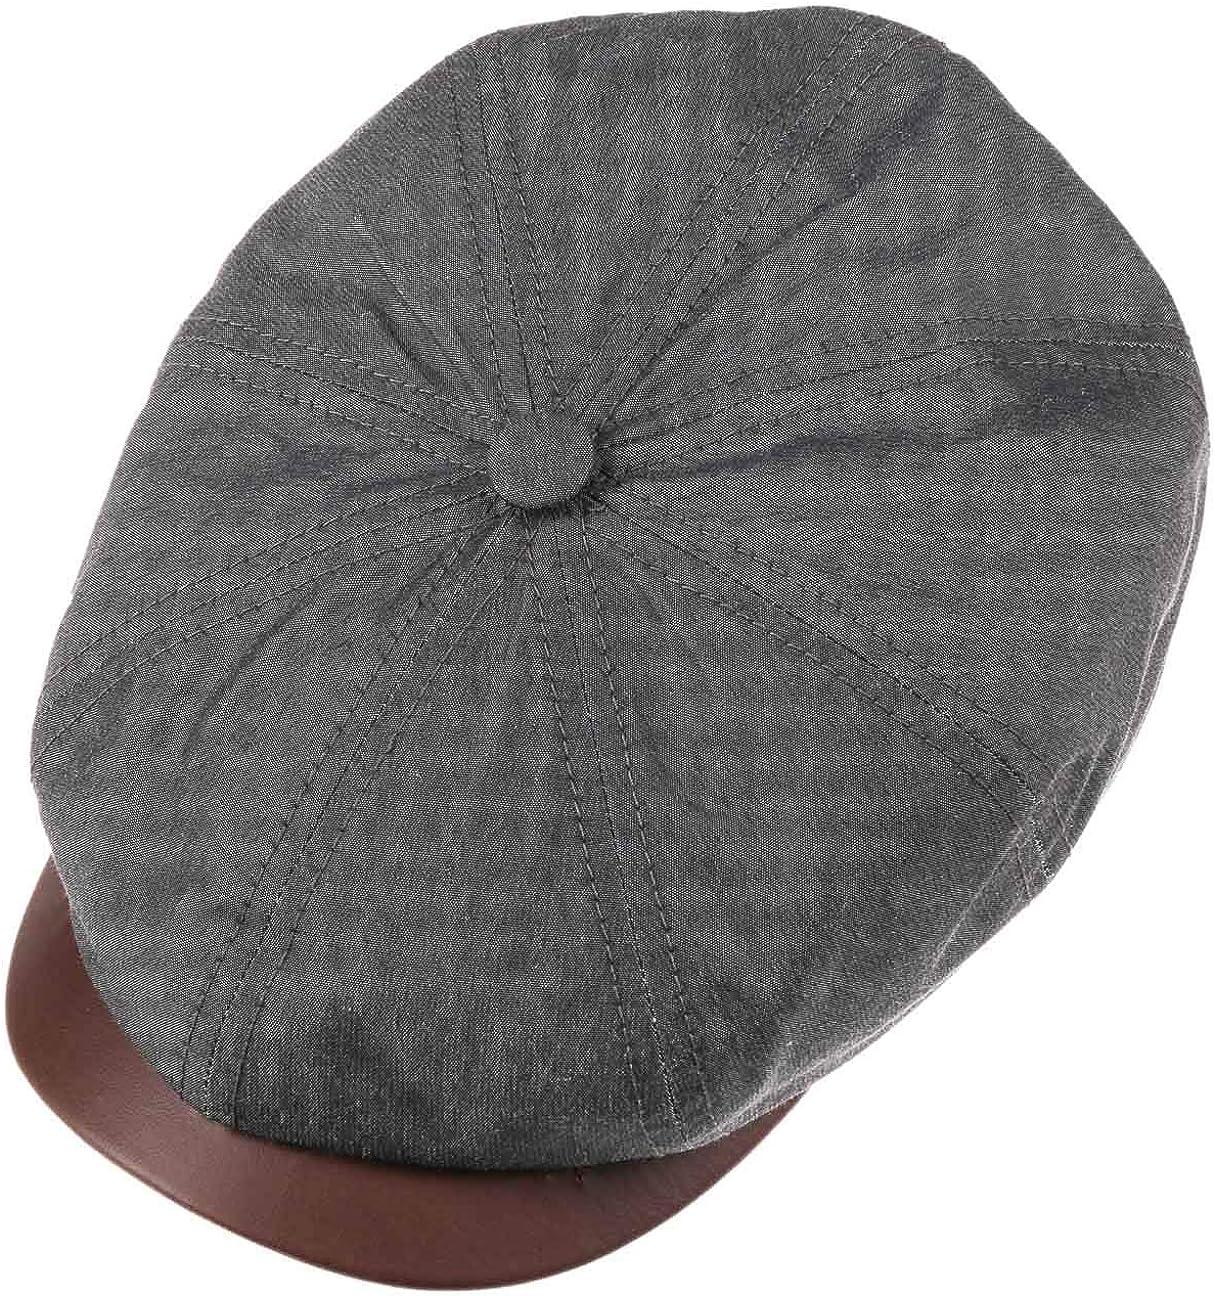 Stetson Gorra Hatteras Waxed Cotton Outdoor Hombre Forro Verano//Invierno Made in Germany de algod/ón Newsboy Verano con Visera Forro